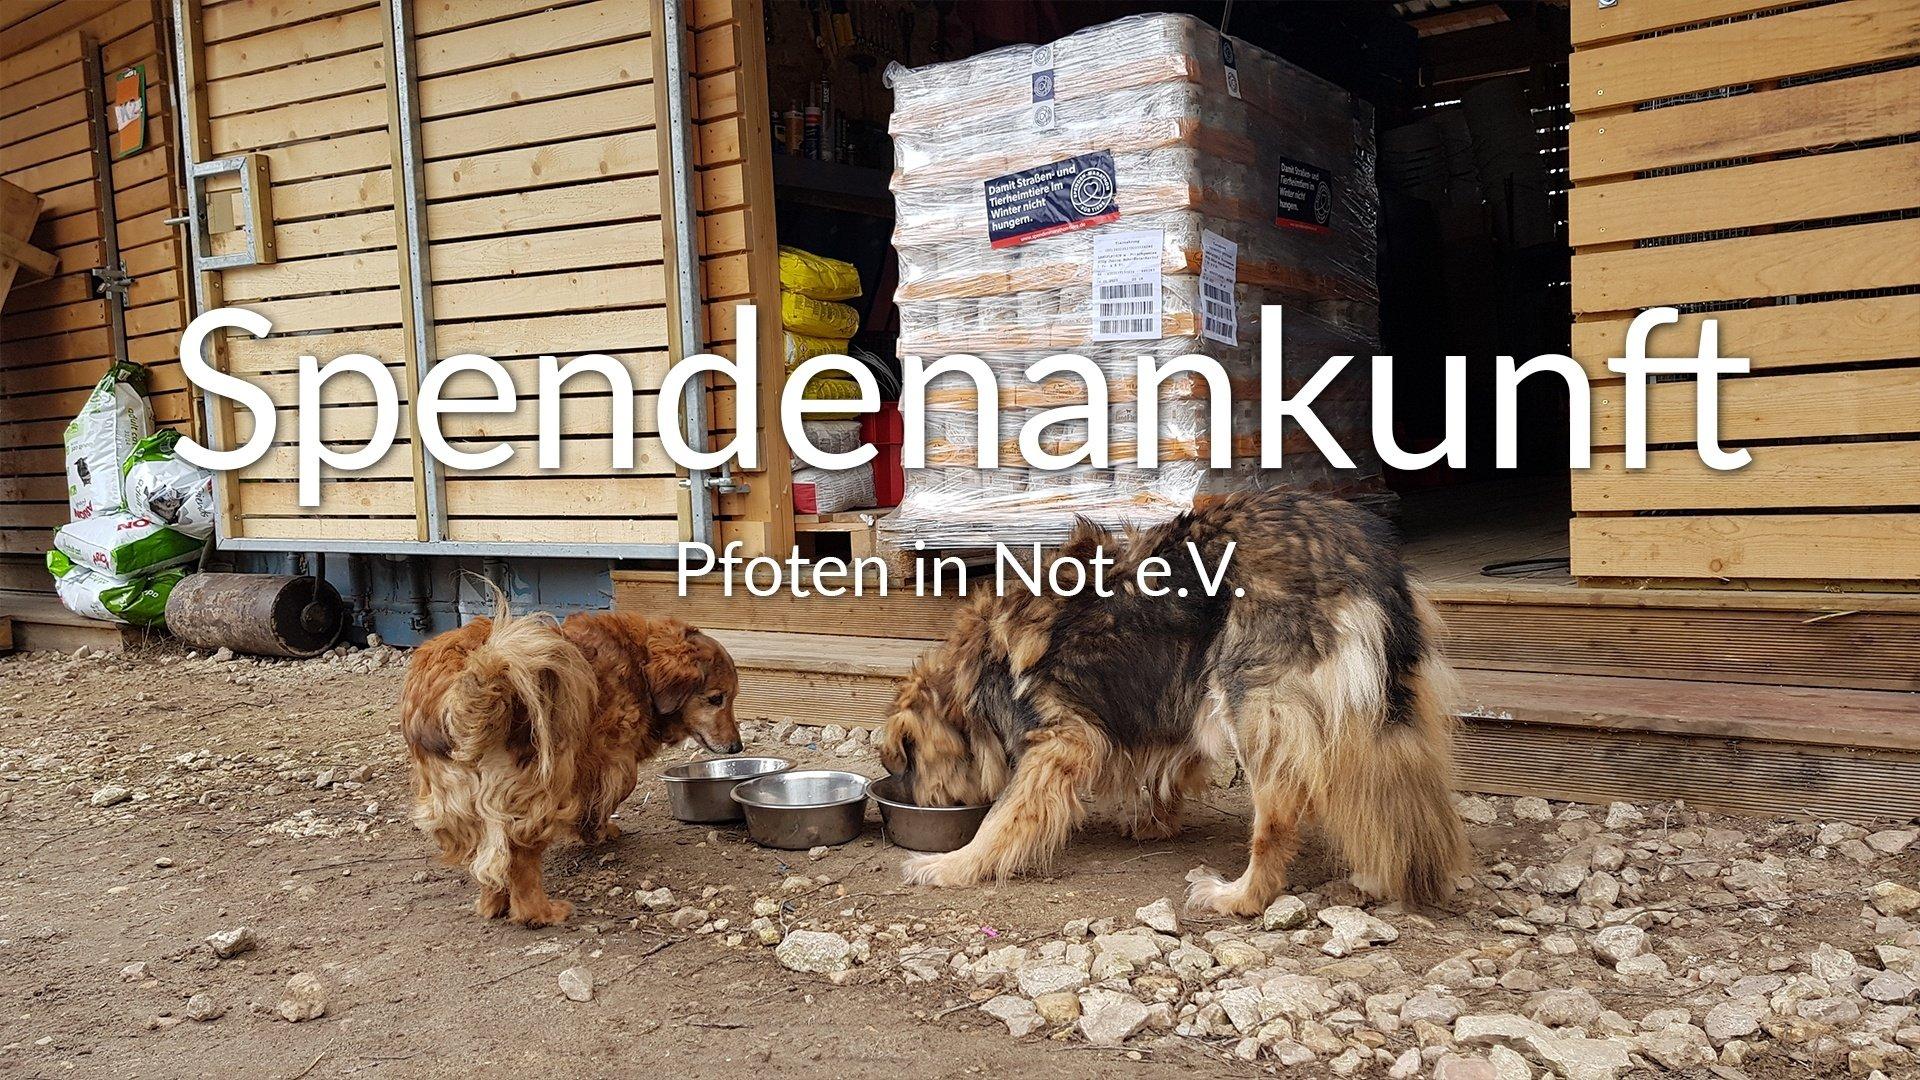 Pfoten in Not e.V.-Futterspendenankunft-maerz-2020-Spenden-Marathon-2019-Lettland-VIDEO